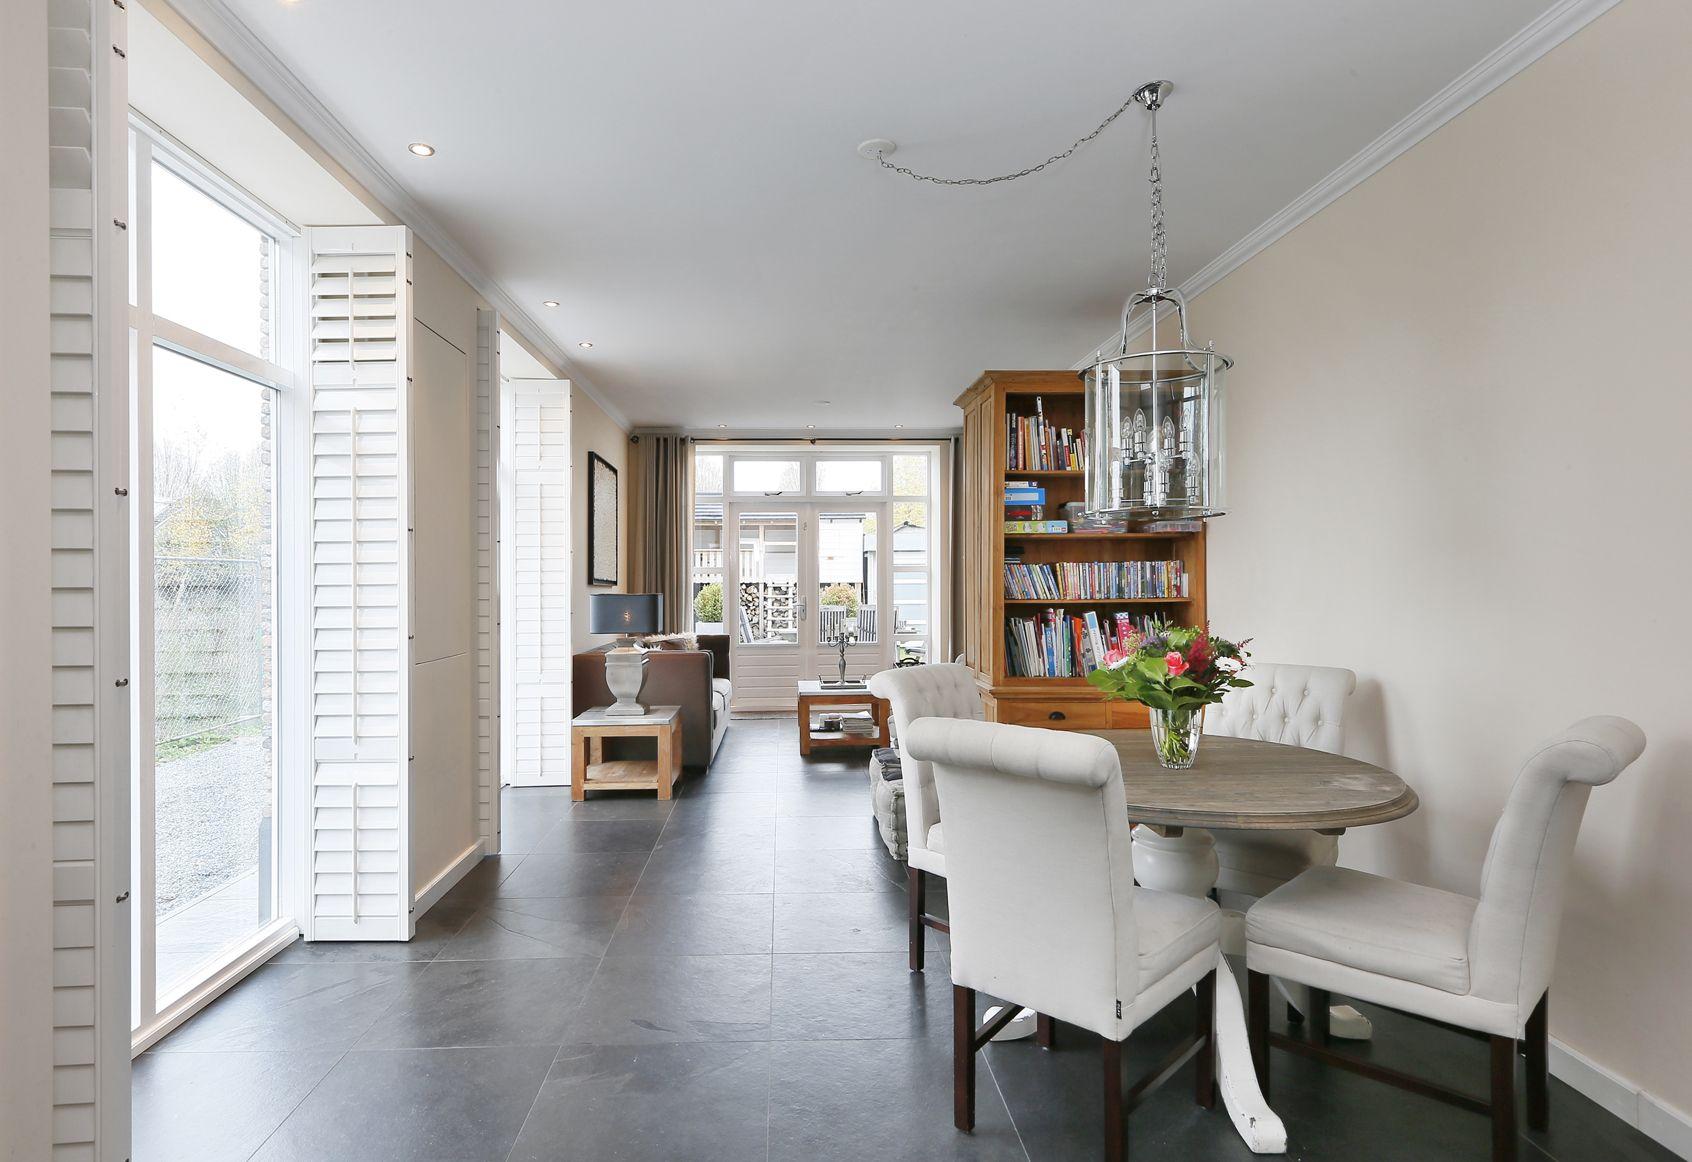 Modern interieur woonhuis te Waalwijk. | Interieur | Pinterest